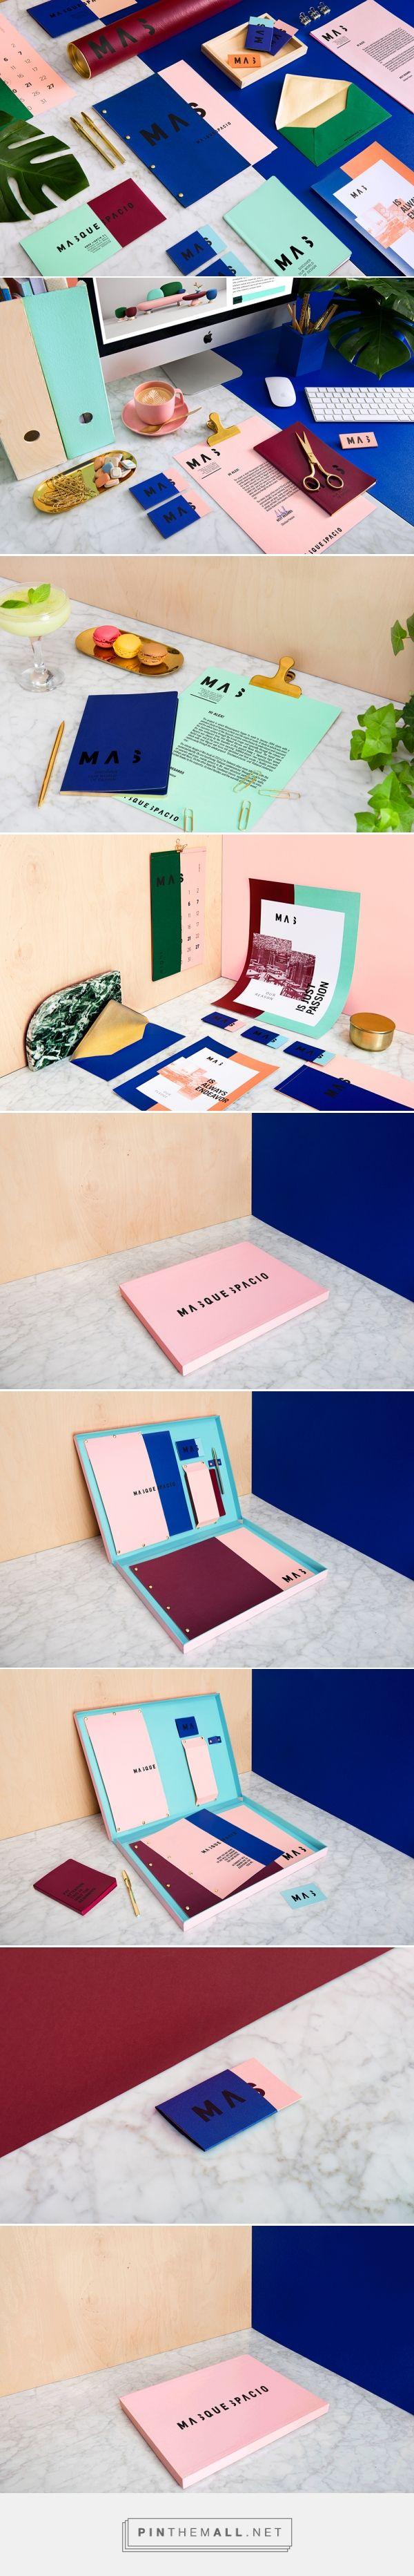 Masquespacio Branding by Masquespacio | Fivestar Branding – Design and Branding Agency & Inspiration Gallery